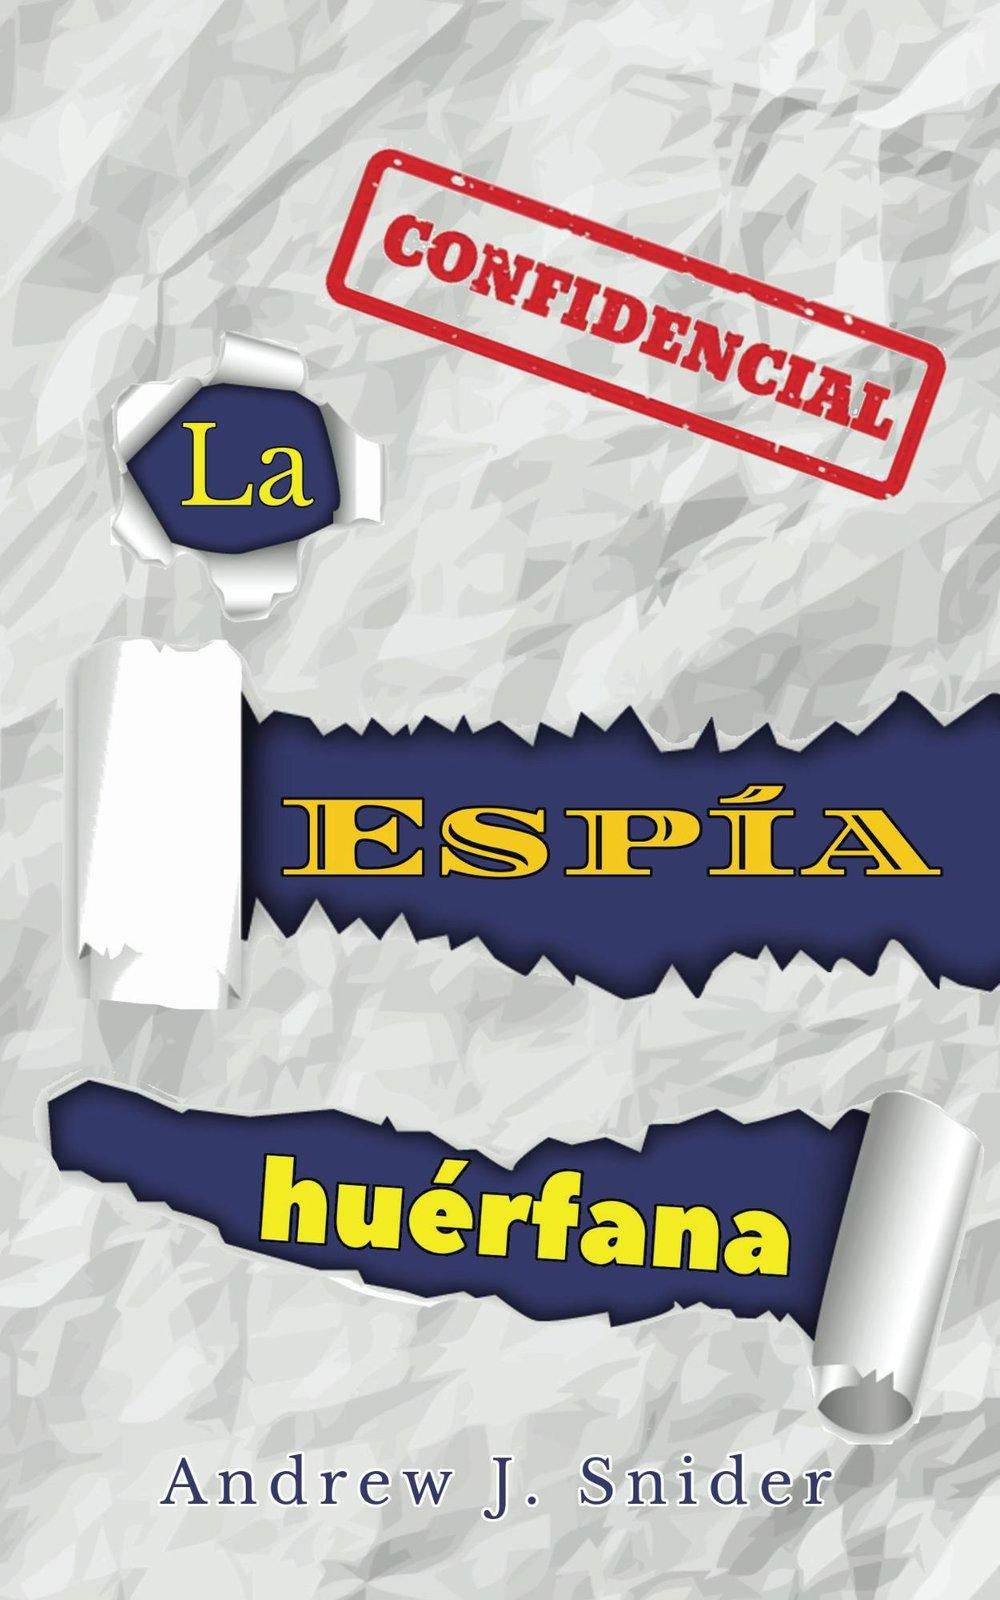 la espía huérfana - Spanish Novel